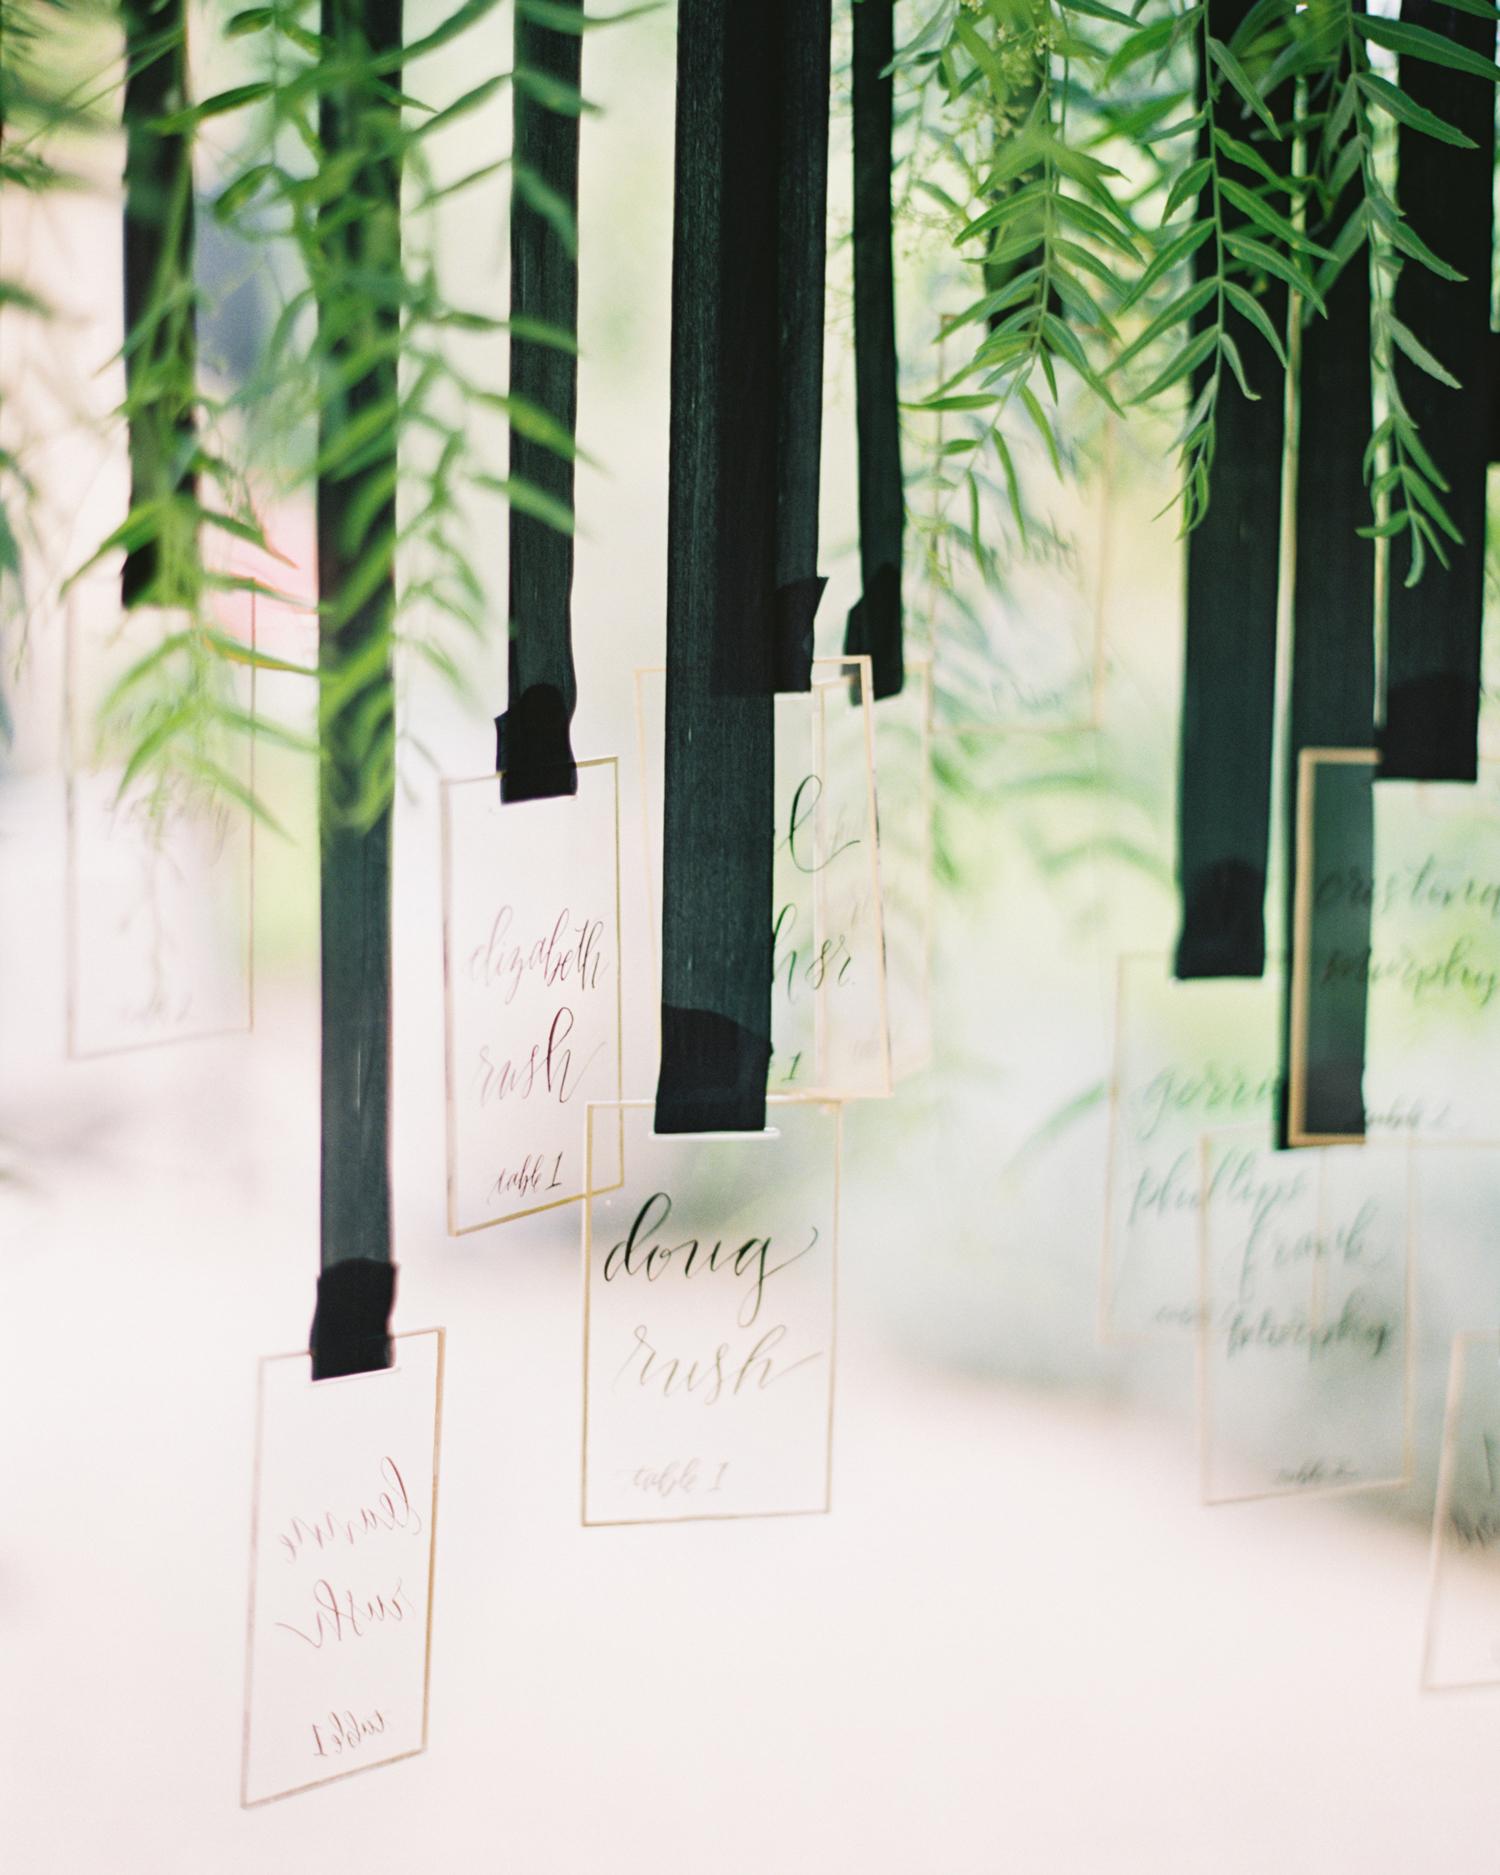 ribbon wedding ideas escort cards hanging from black ribbon